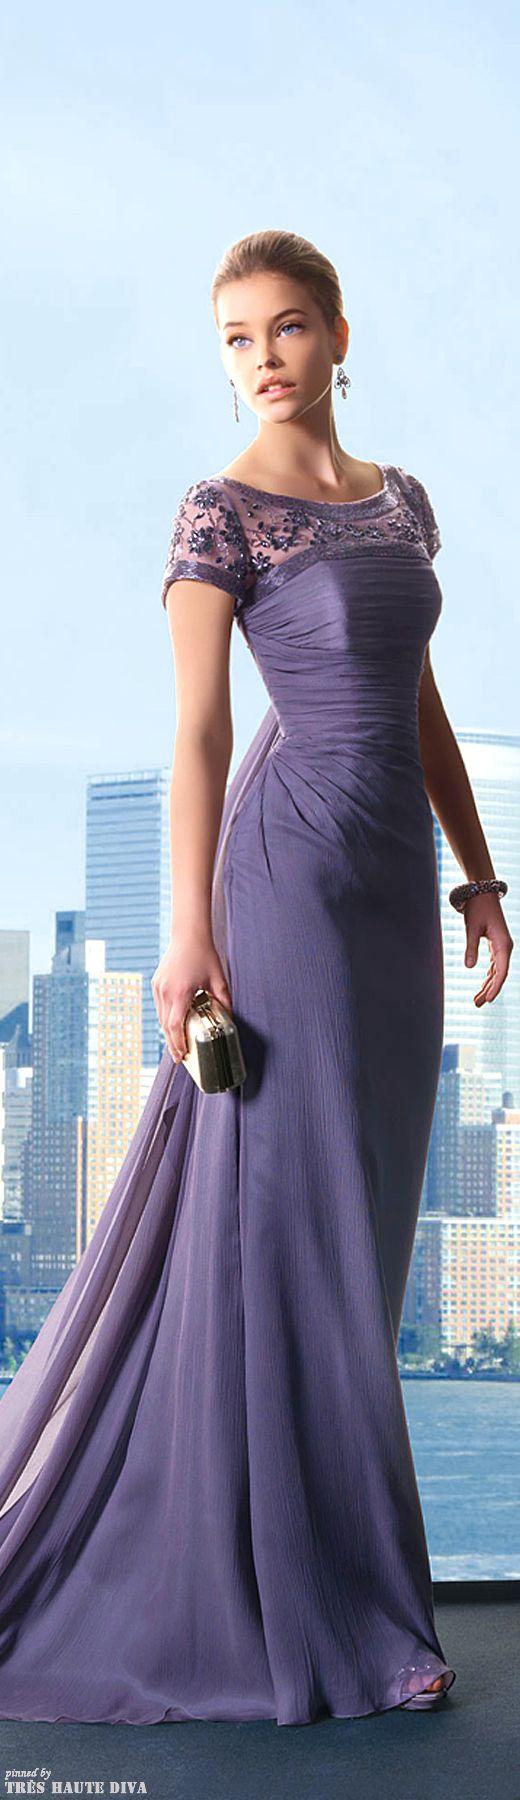 Penthouse Life | Fashion Style | Pinterest | Rosa clará, Vestiditos ...